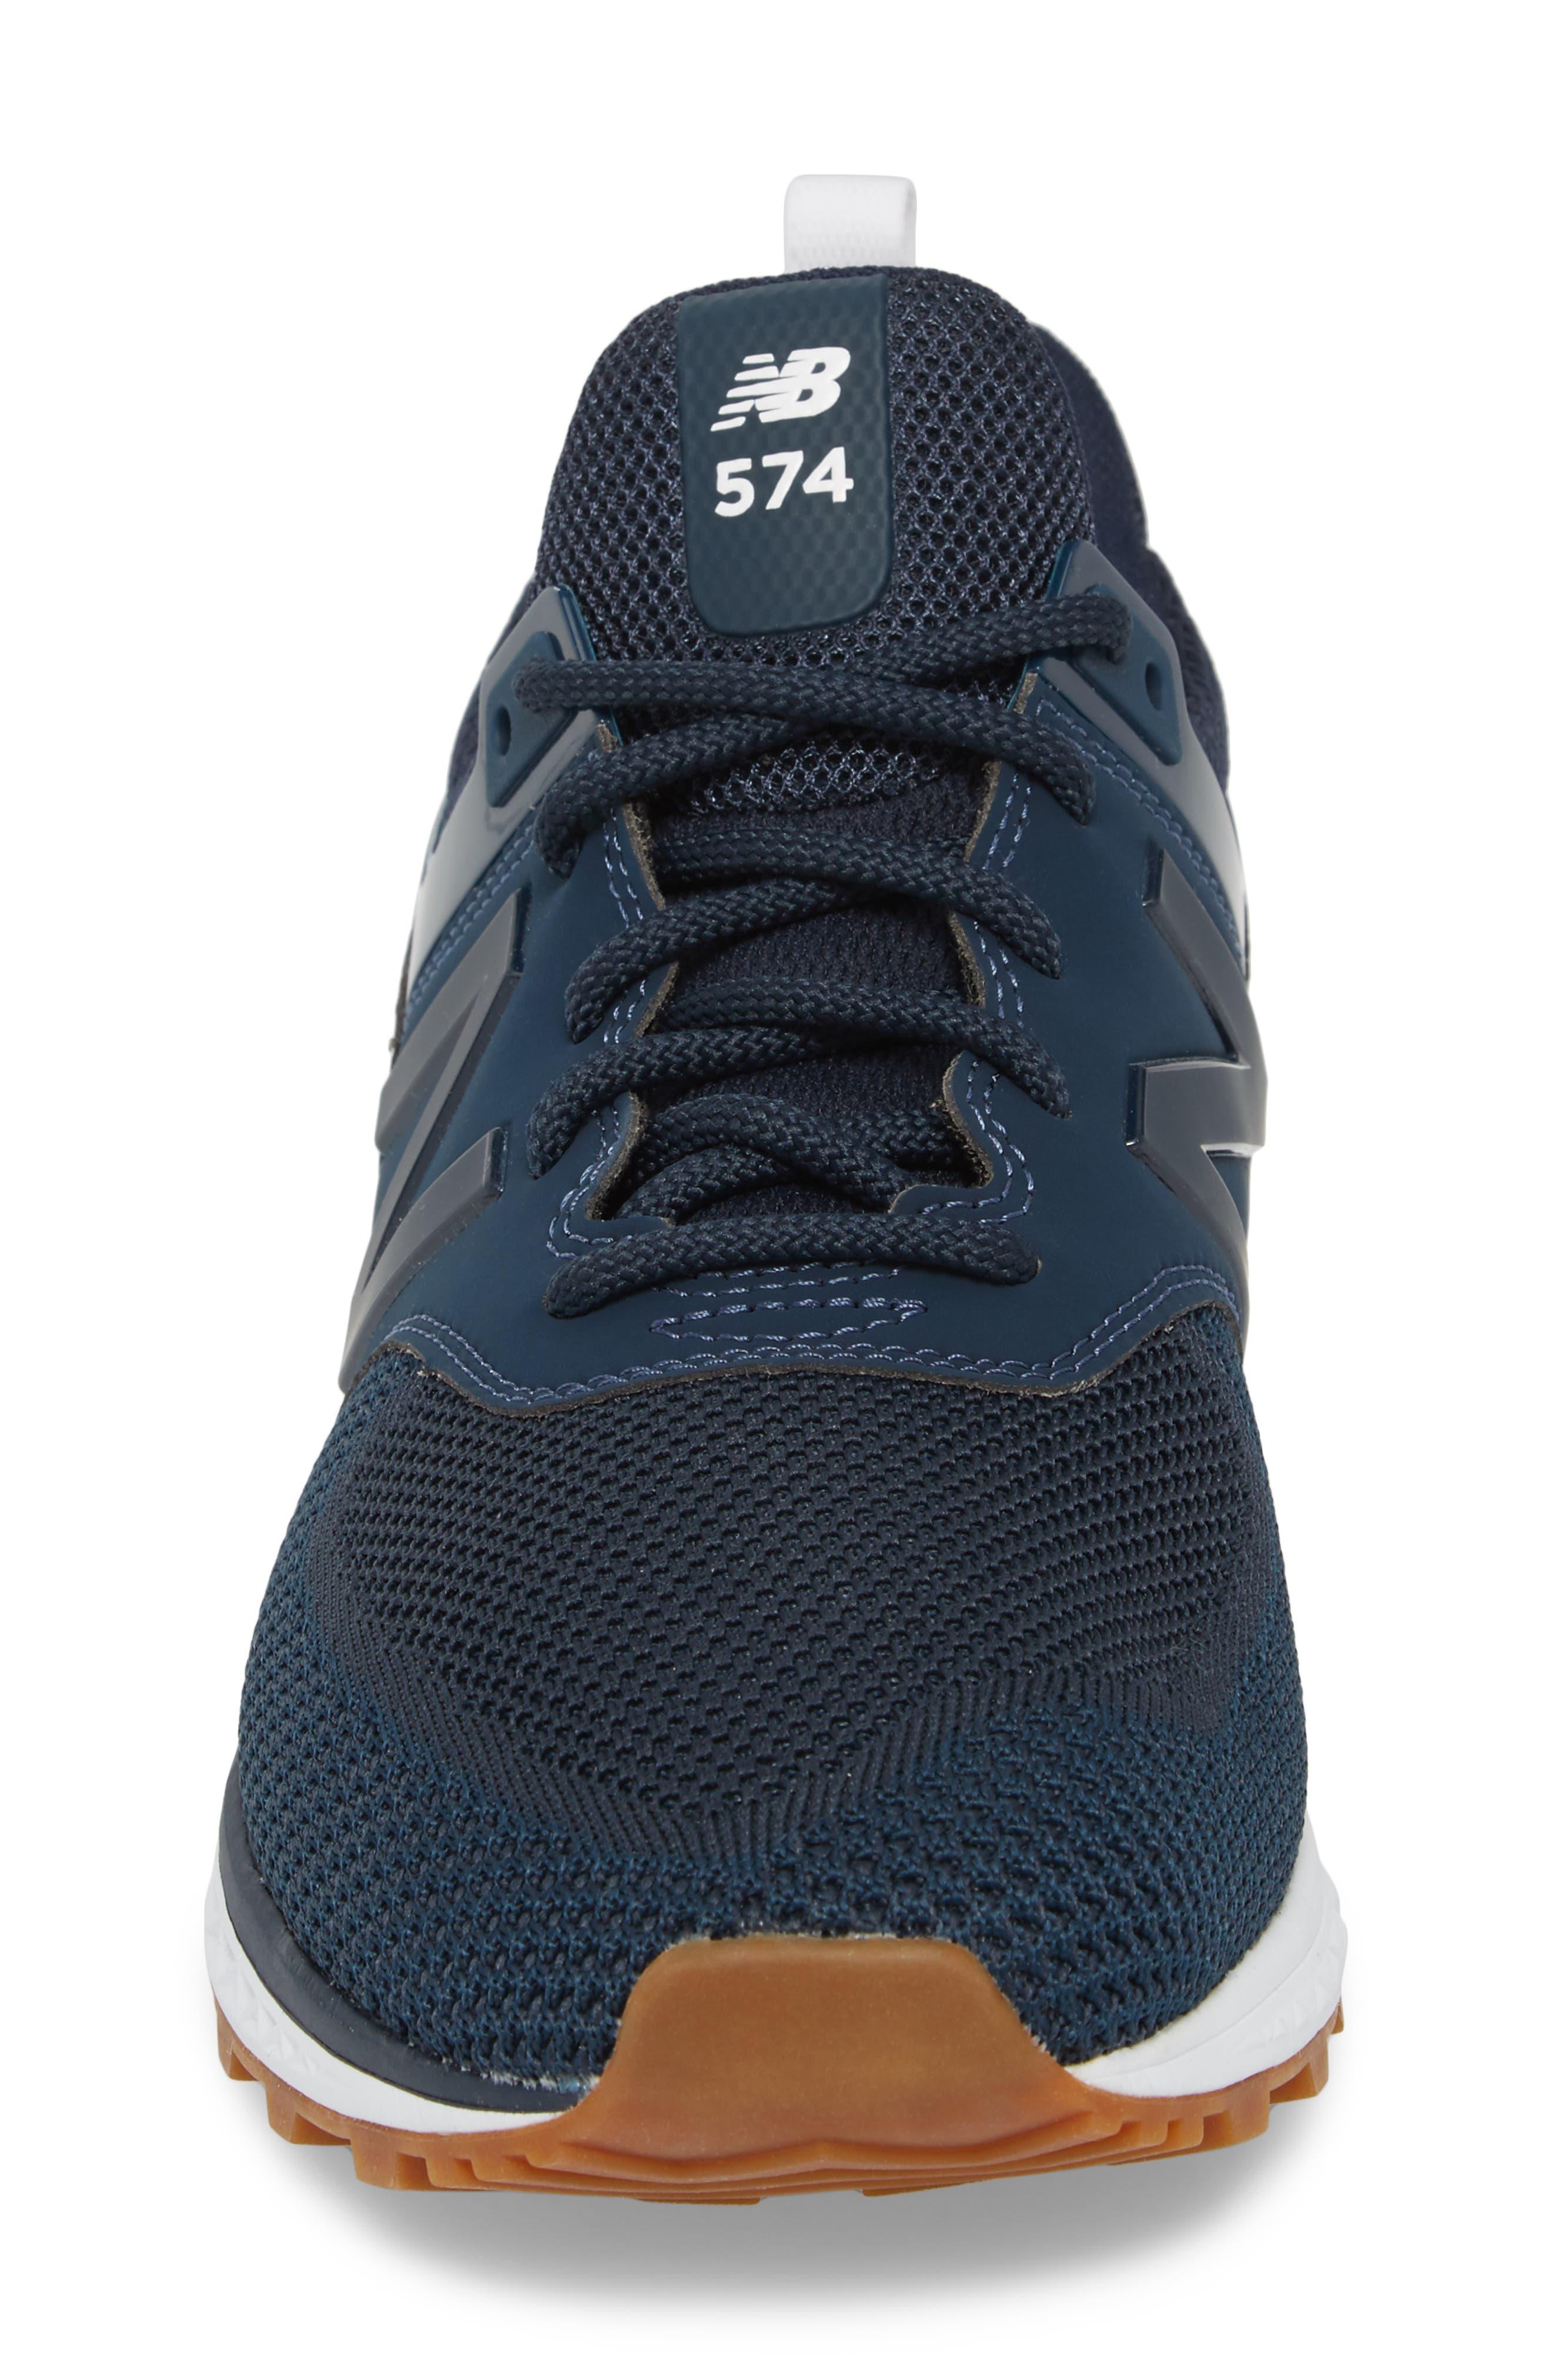 574 Engineered Mesh Sneaker,                             Alternate thumbnail 4, color,                             Vintage Indigo